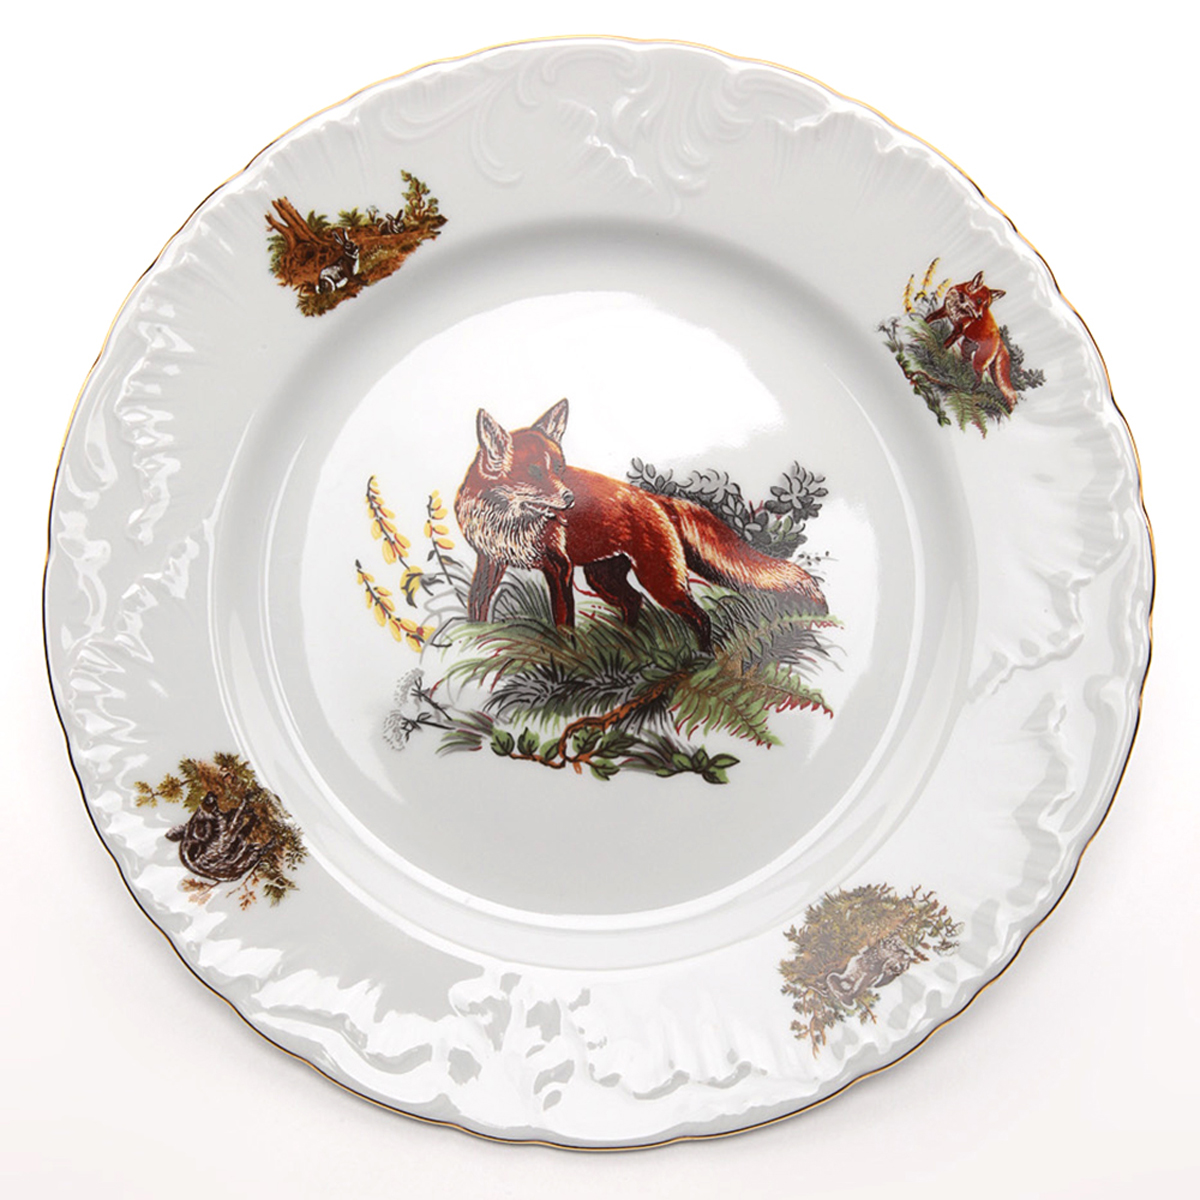 Фото - Тарелка мелкая Cmielow Rococo. Охота, диаметр 25 см тарелка десертная cmielow rococo диаметр 17 см